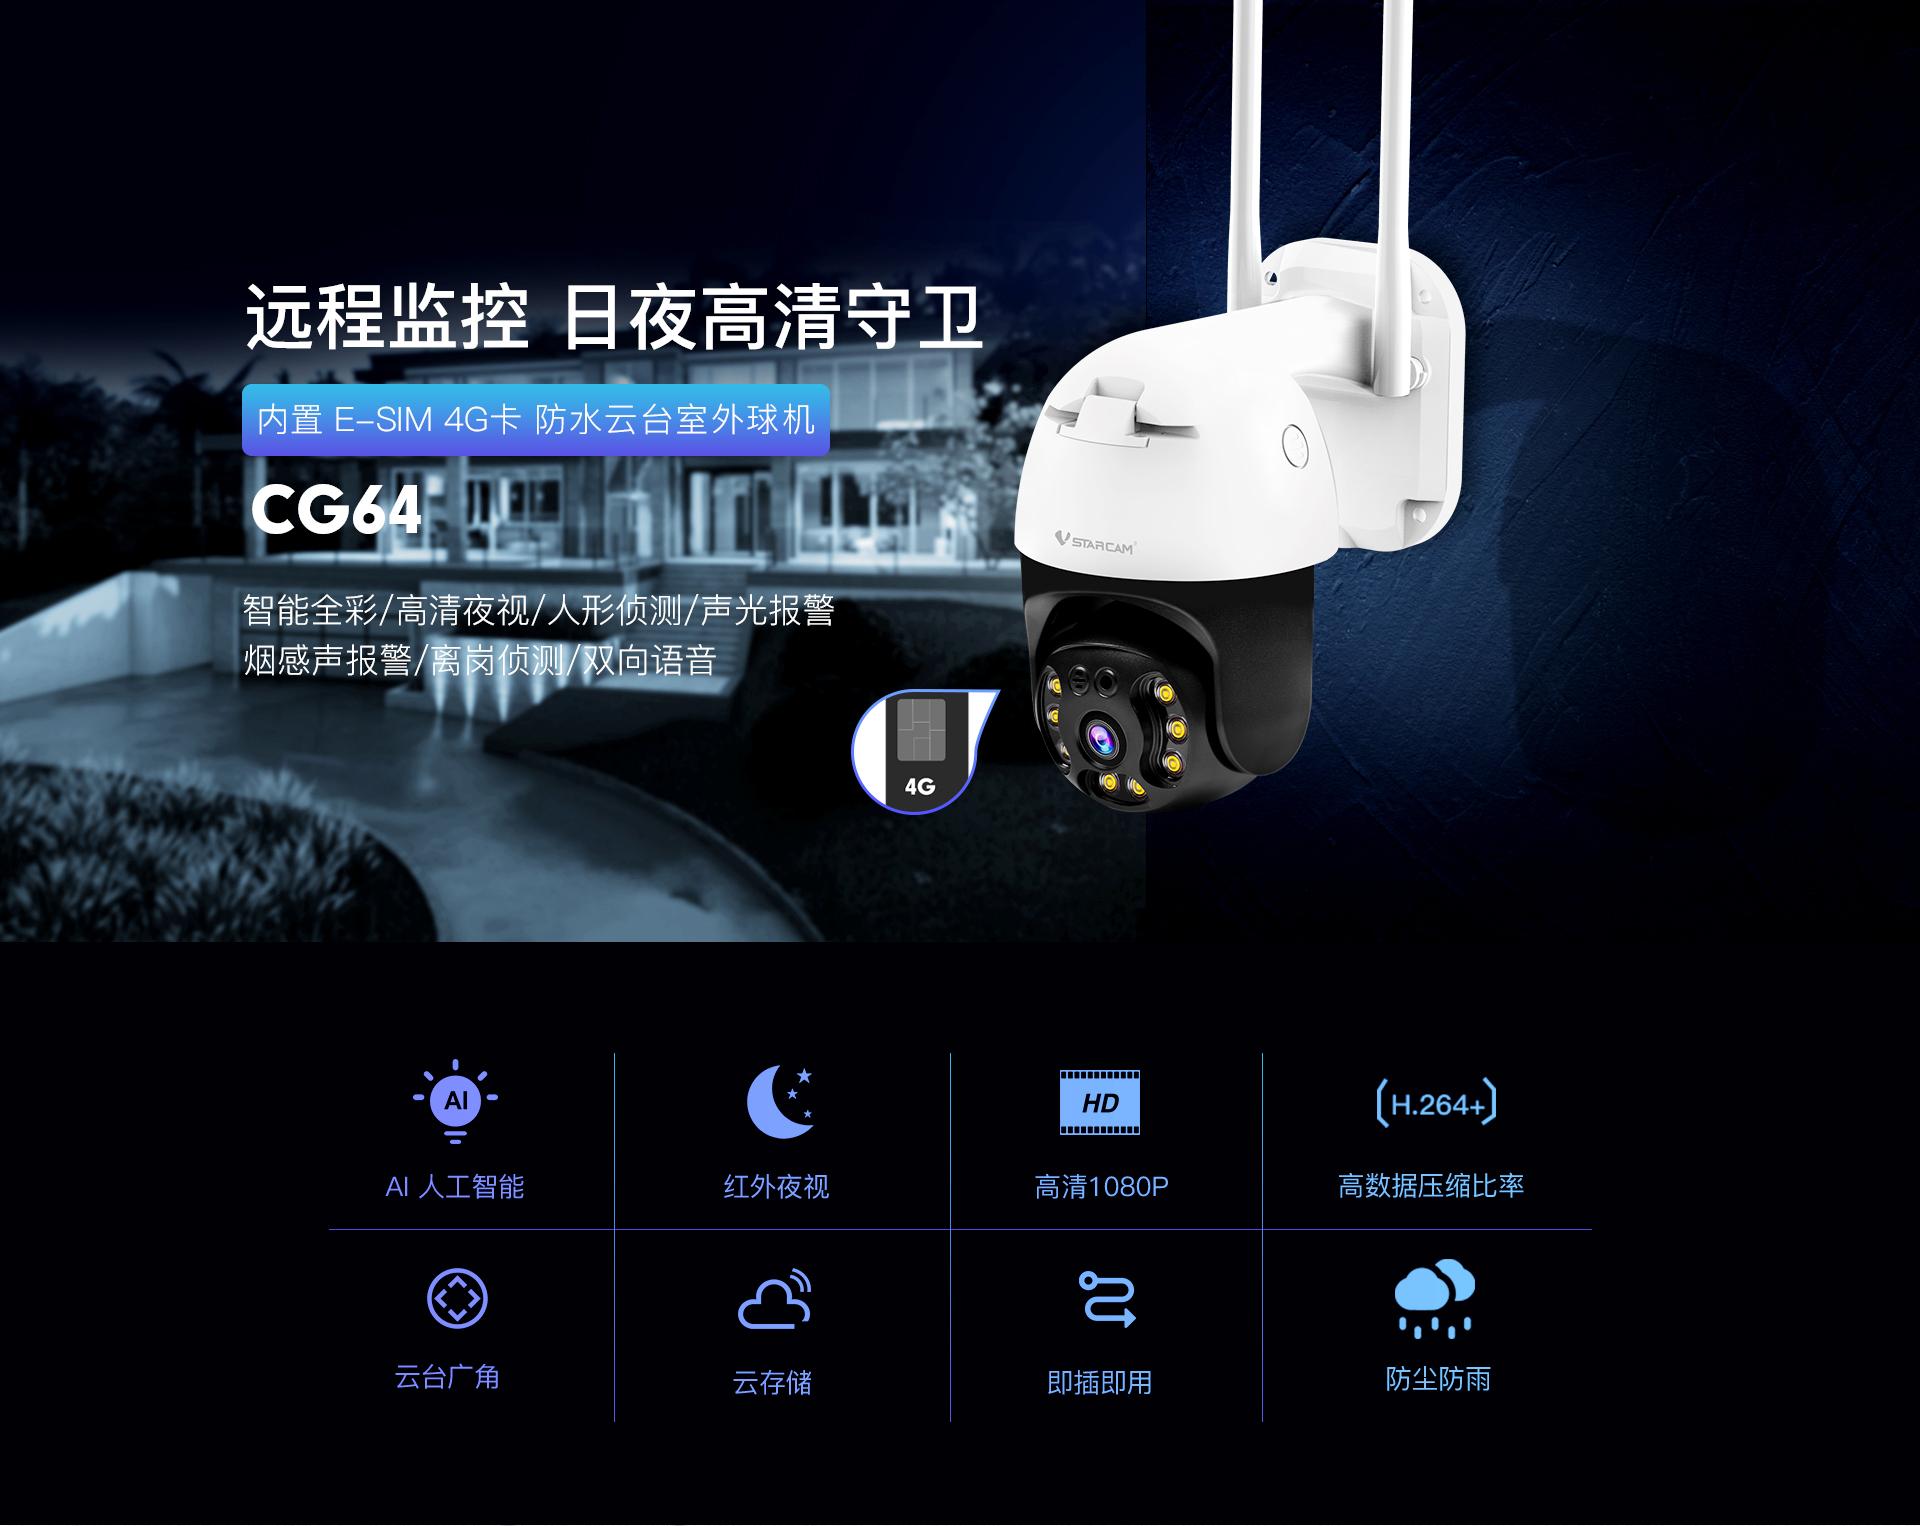 4G室外网络摄像机